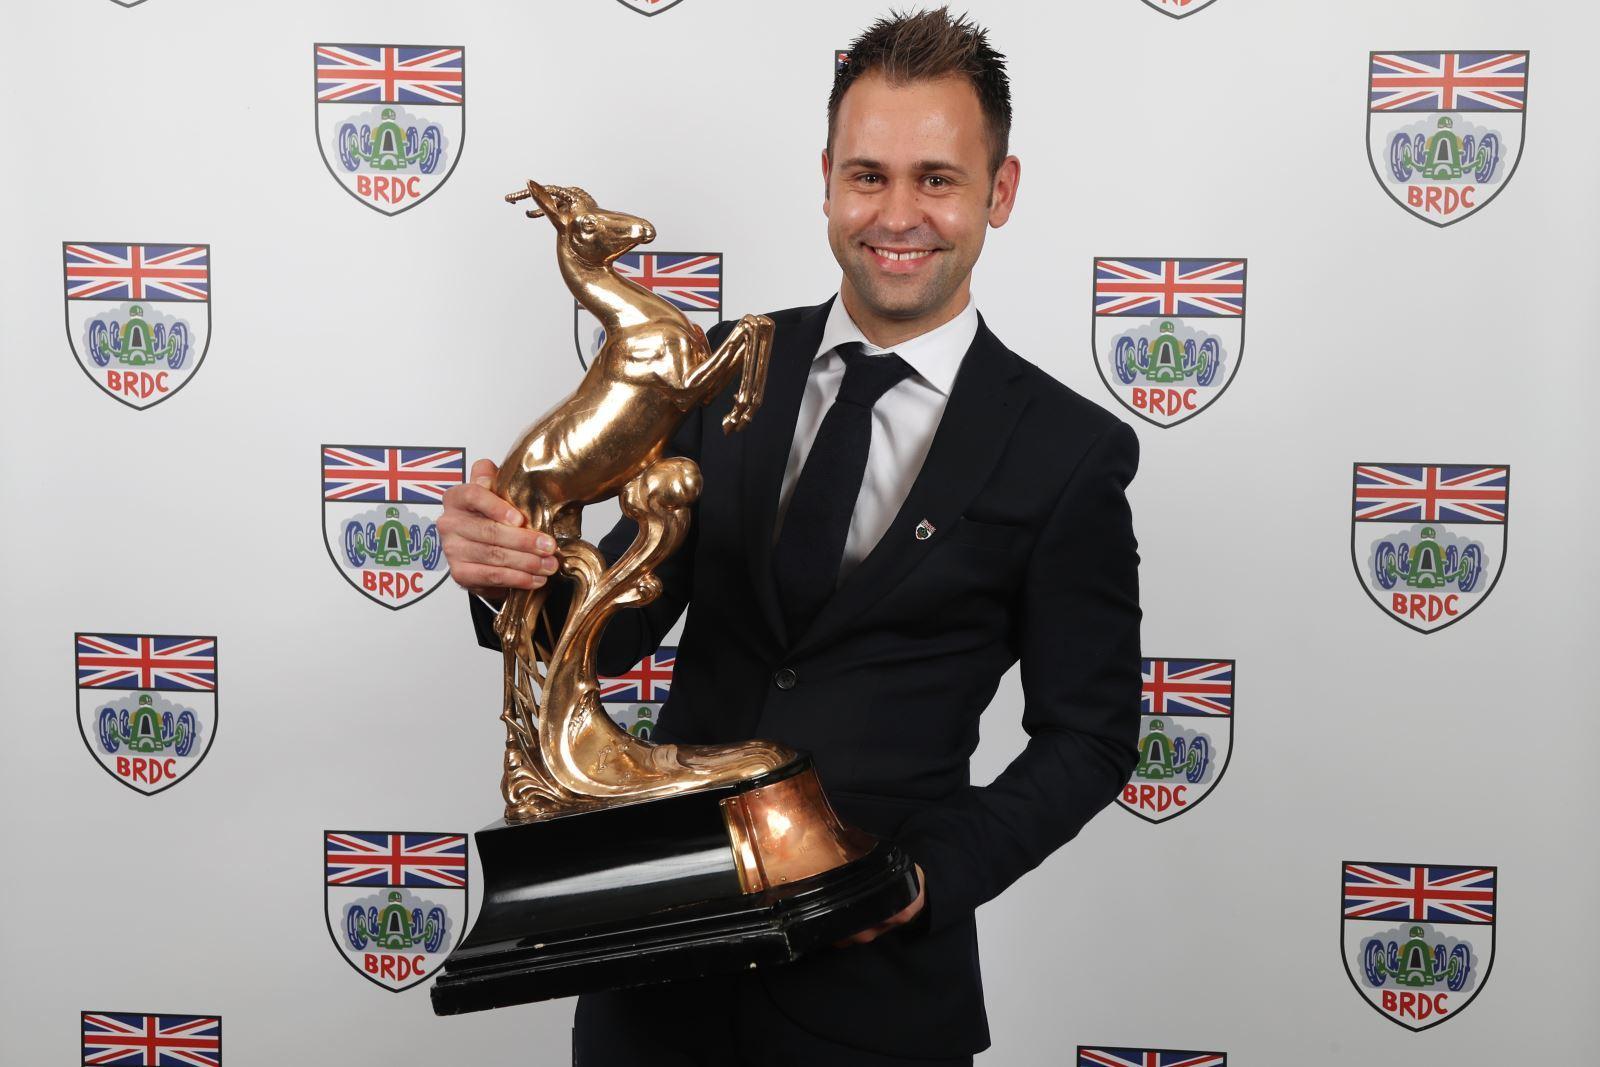 Jonny Adam with the BRDC Fairfield Trophy awarded for his 2017 Le Mans success